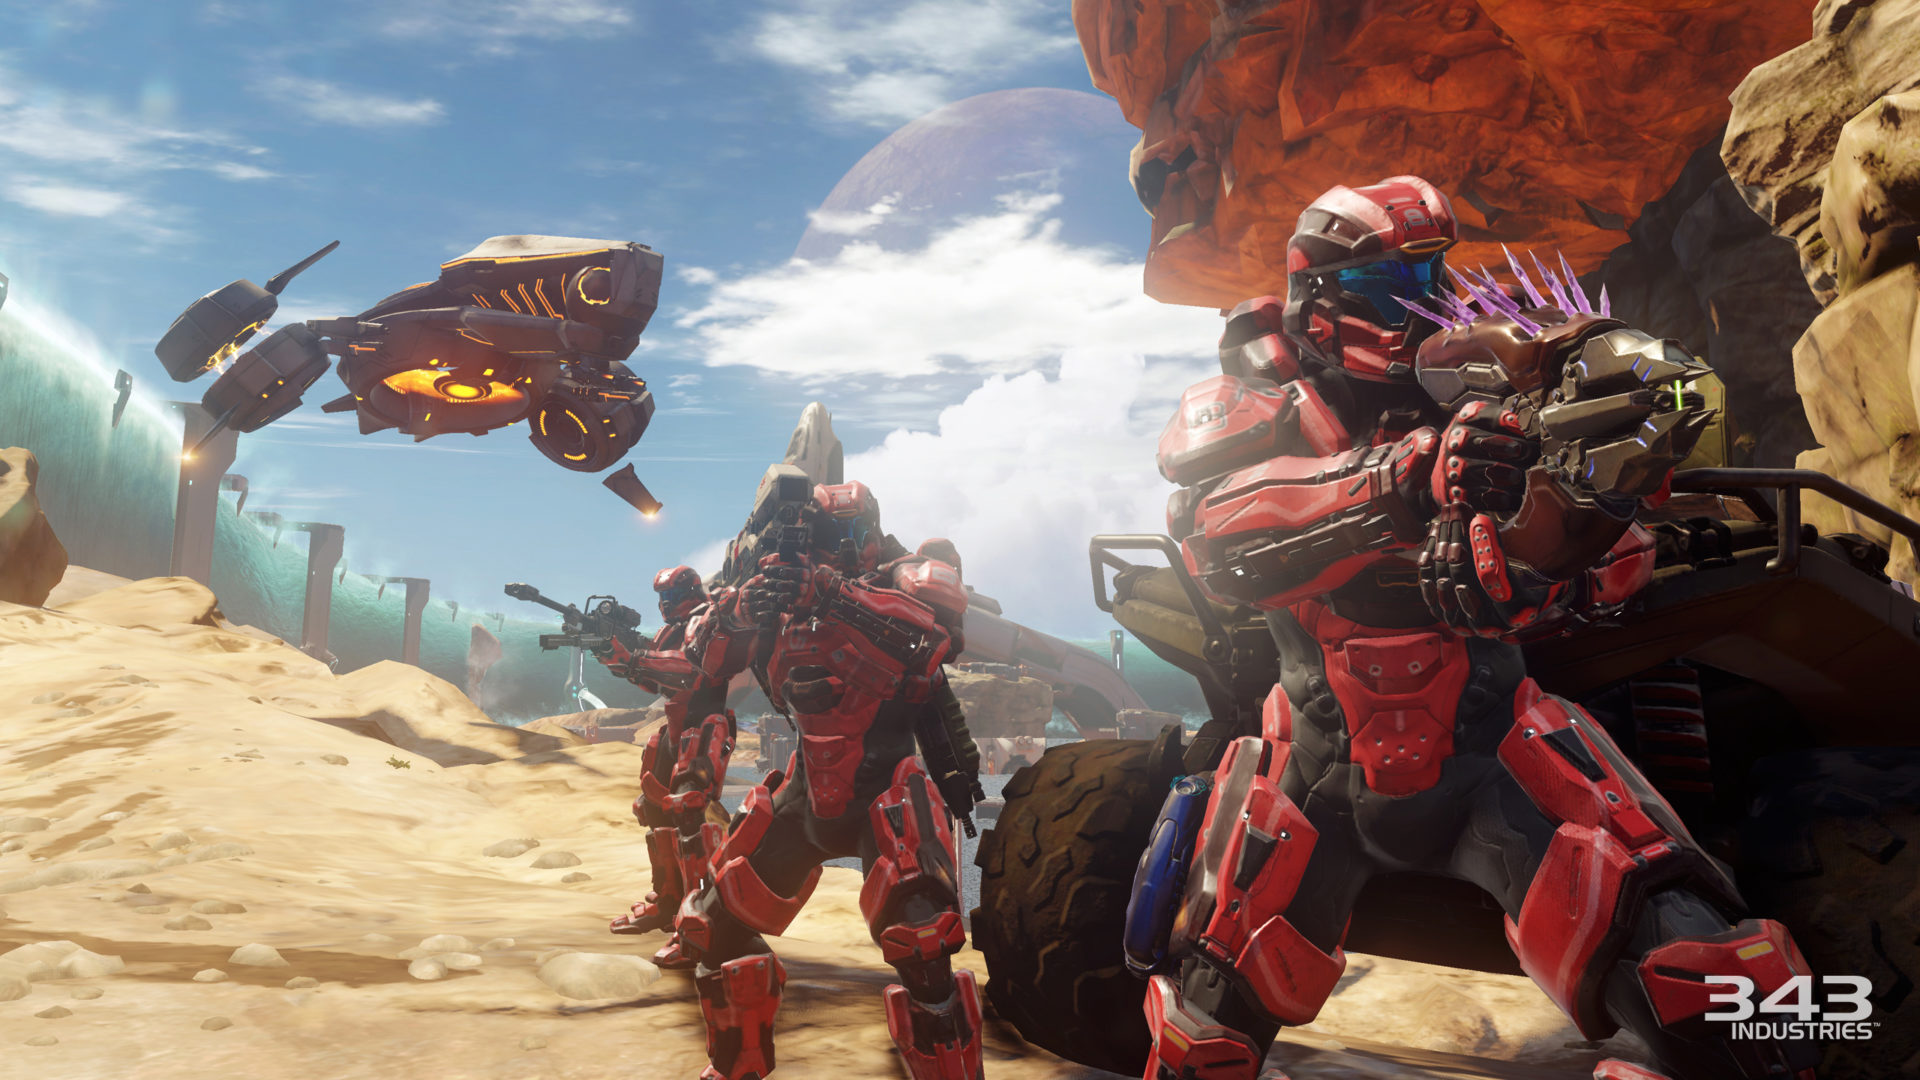 Halo 5 matchmaking ban time, redlightdistrictsexvideos